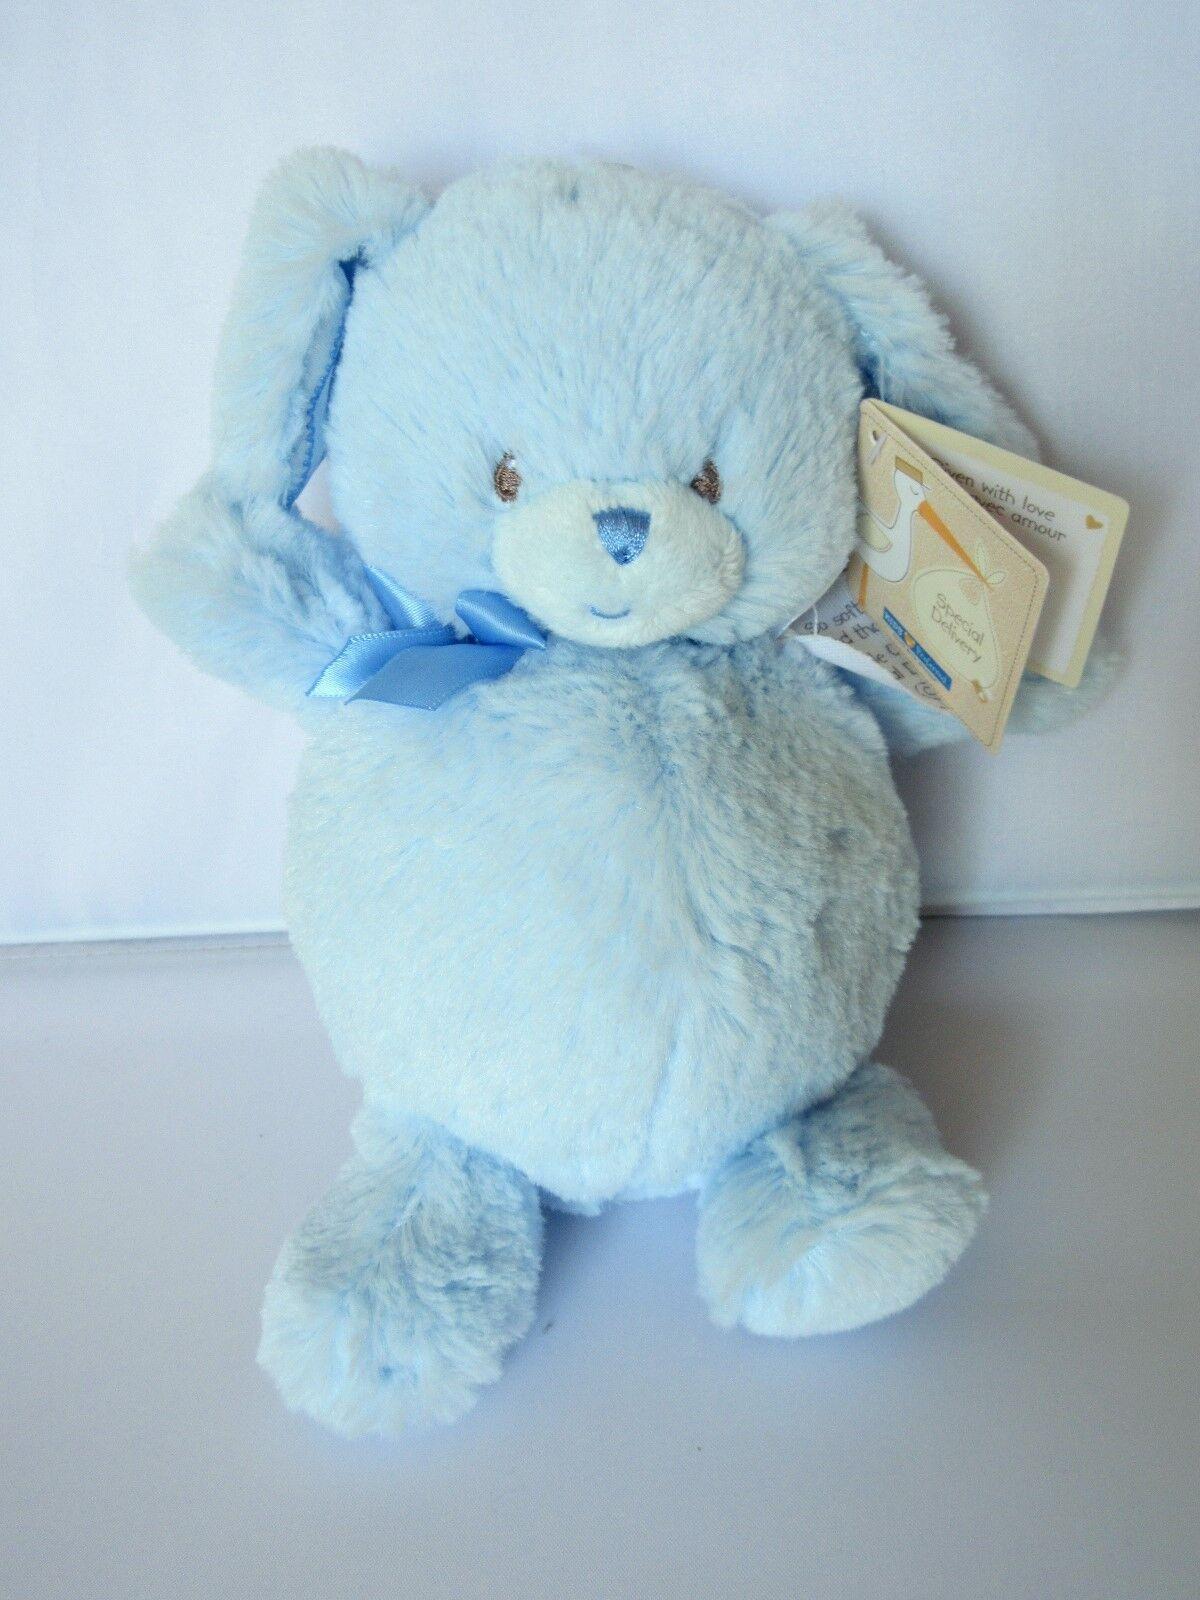 Kids Preferred Baby Blue Dog Plush Doll Stuffed Animal Toy S